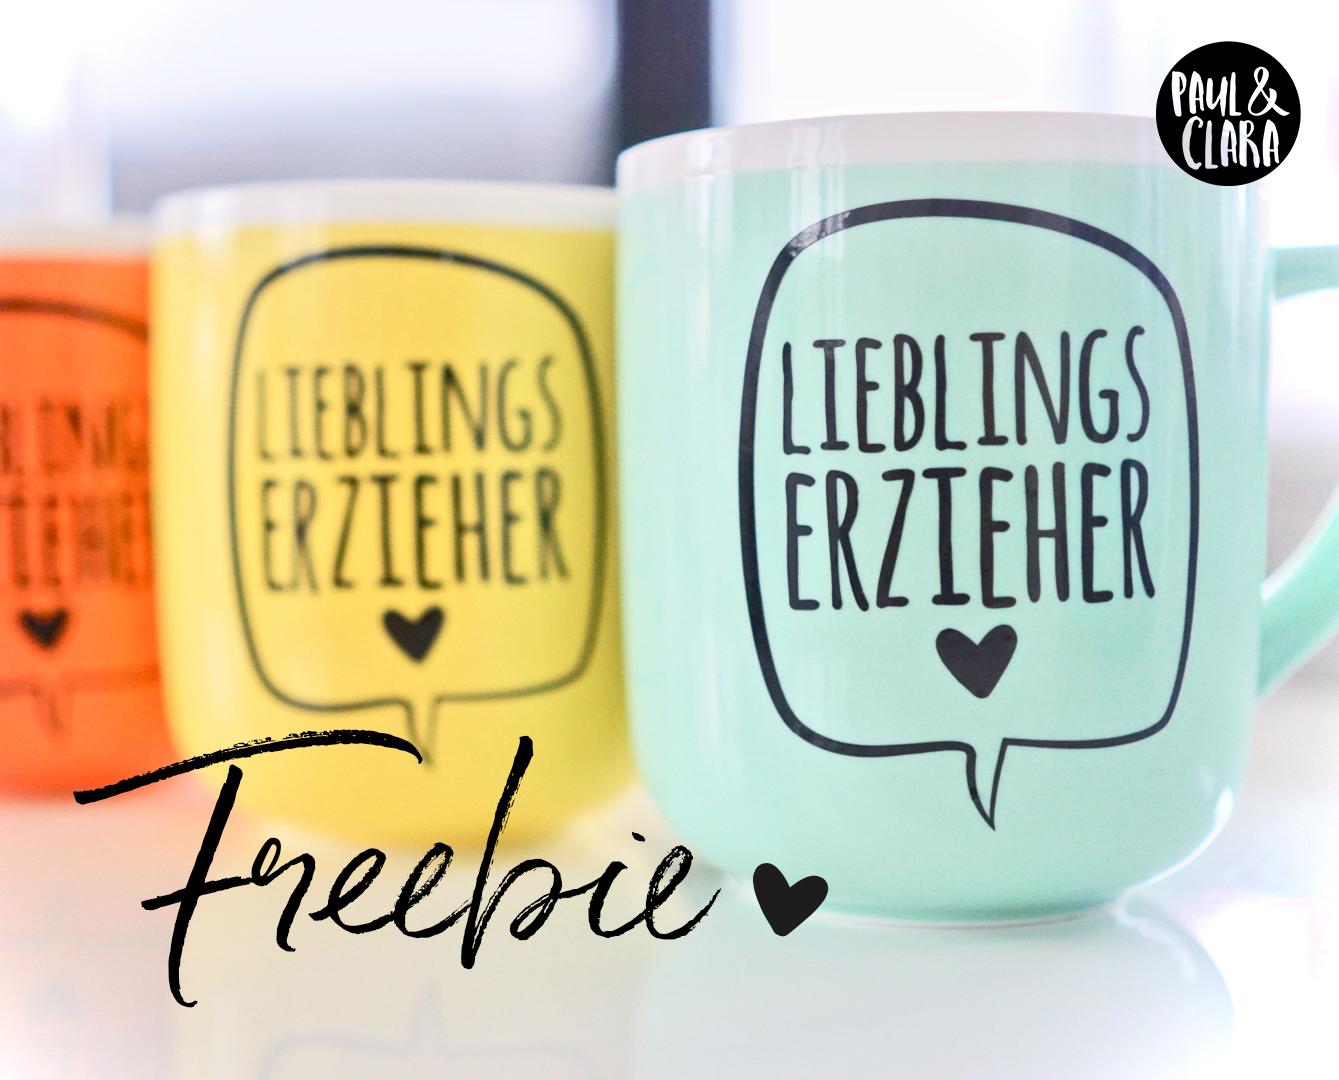 Freebie* Lieblingserzieher | Paul & Clara